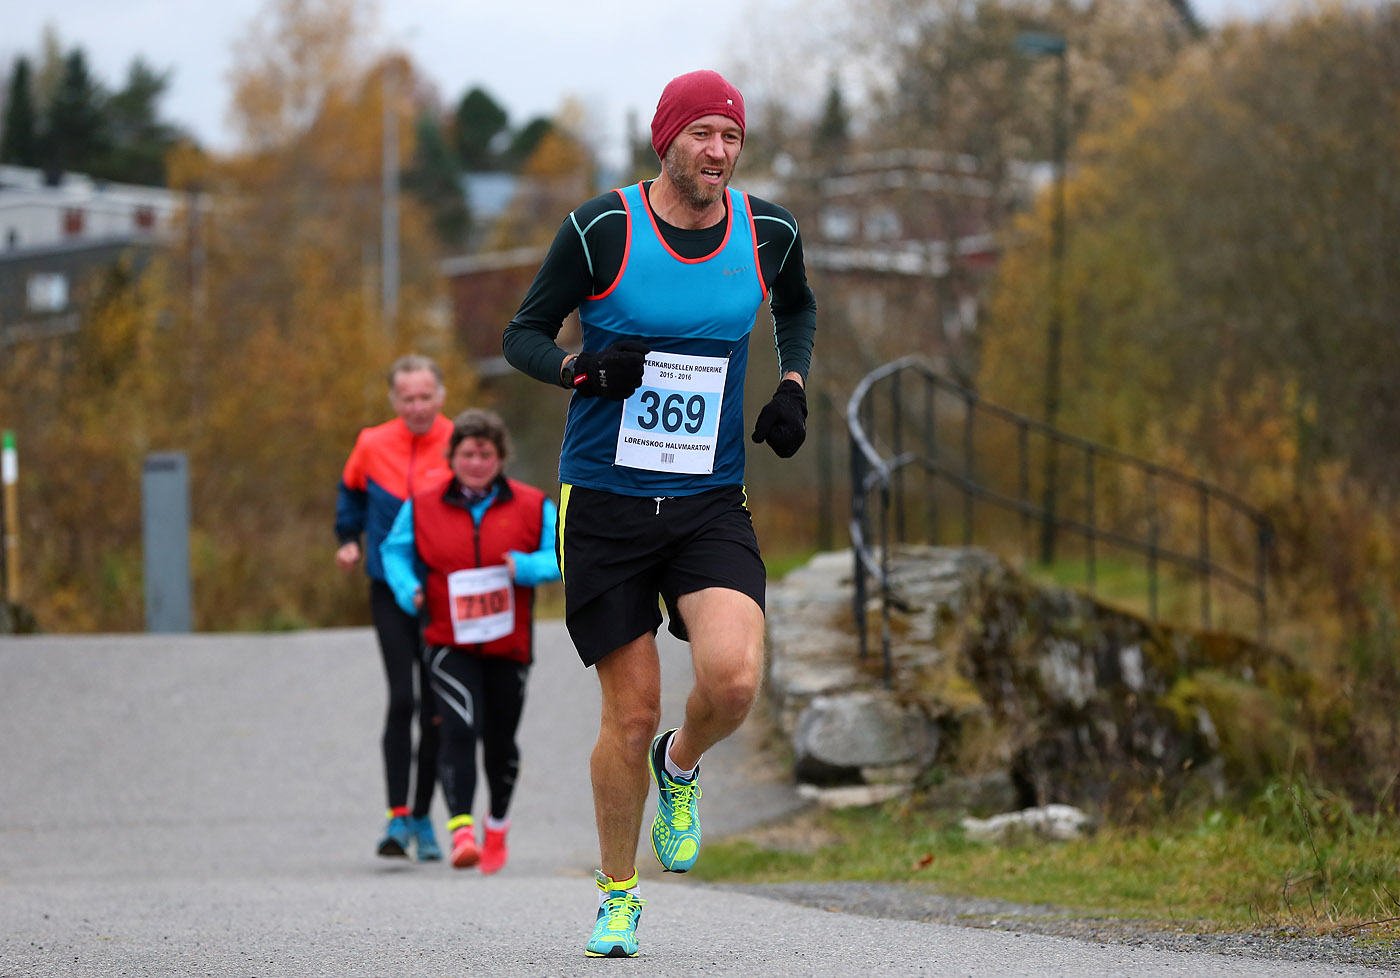 Vinterkarusellen-2015-2016-6km-Knut-Morten-Engen.jpg